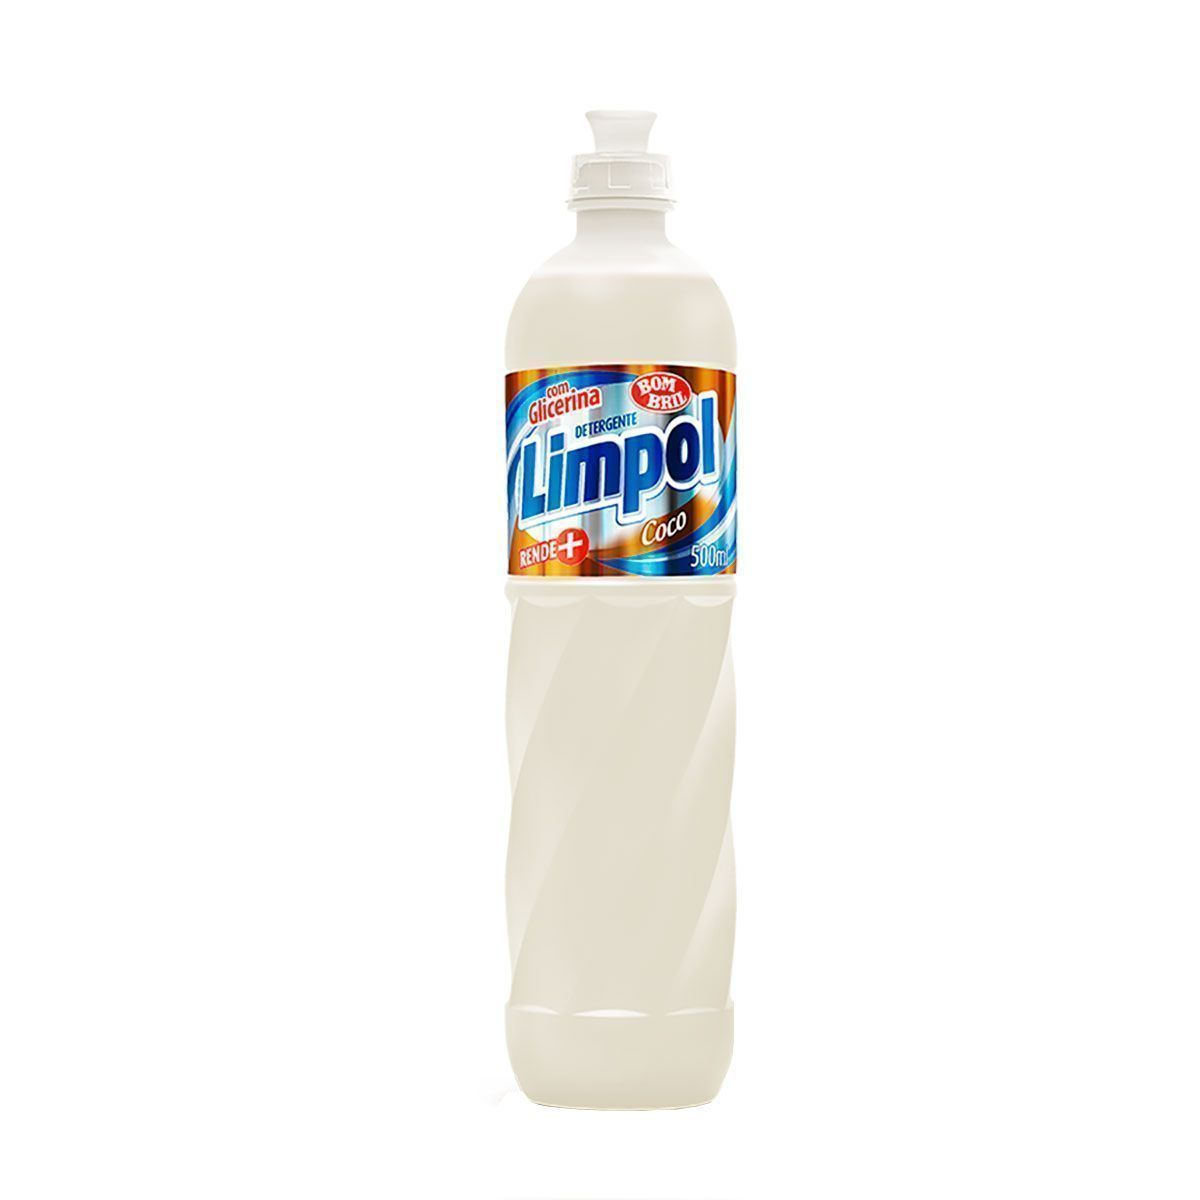 Detergente Limpol Côco 500ml